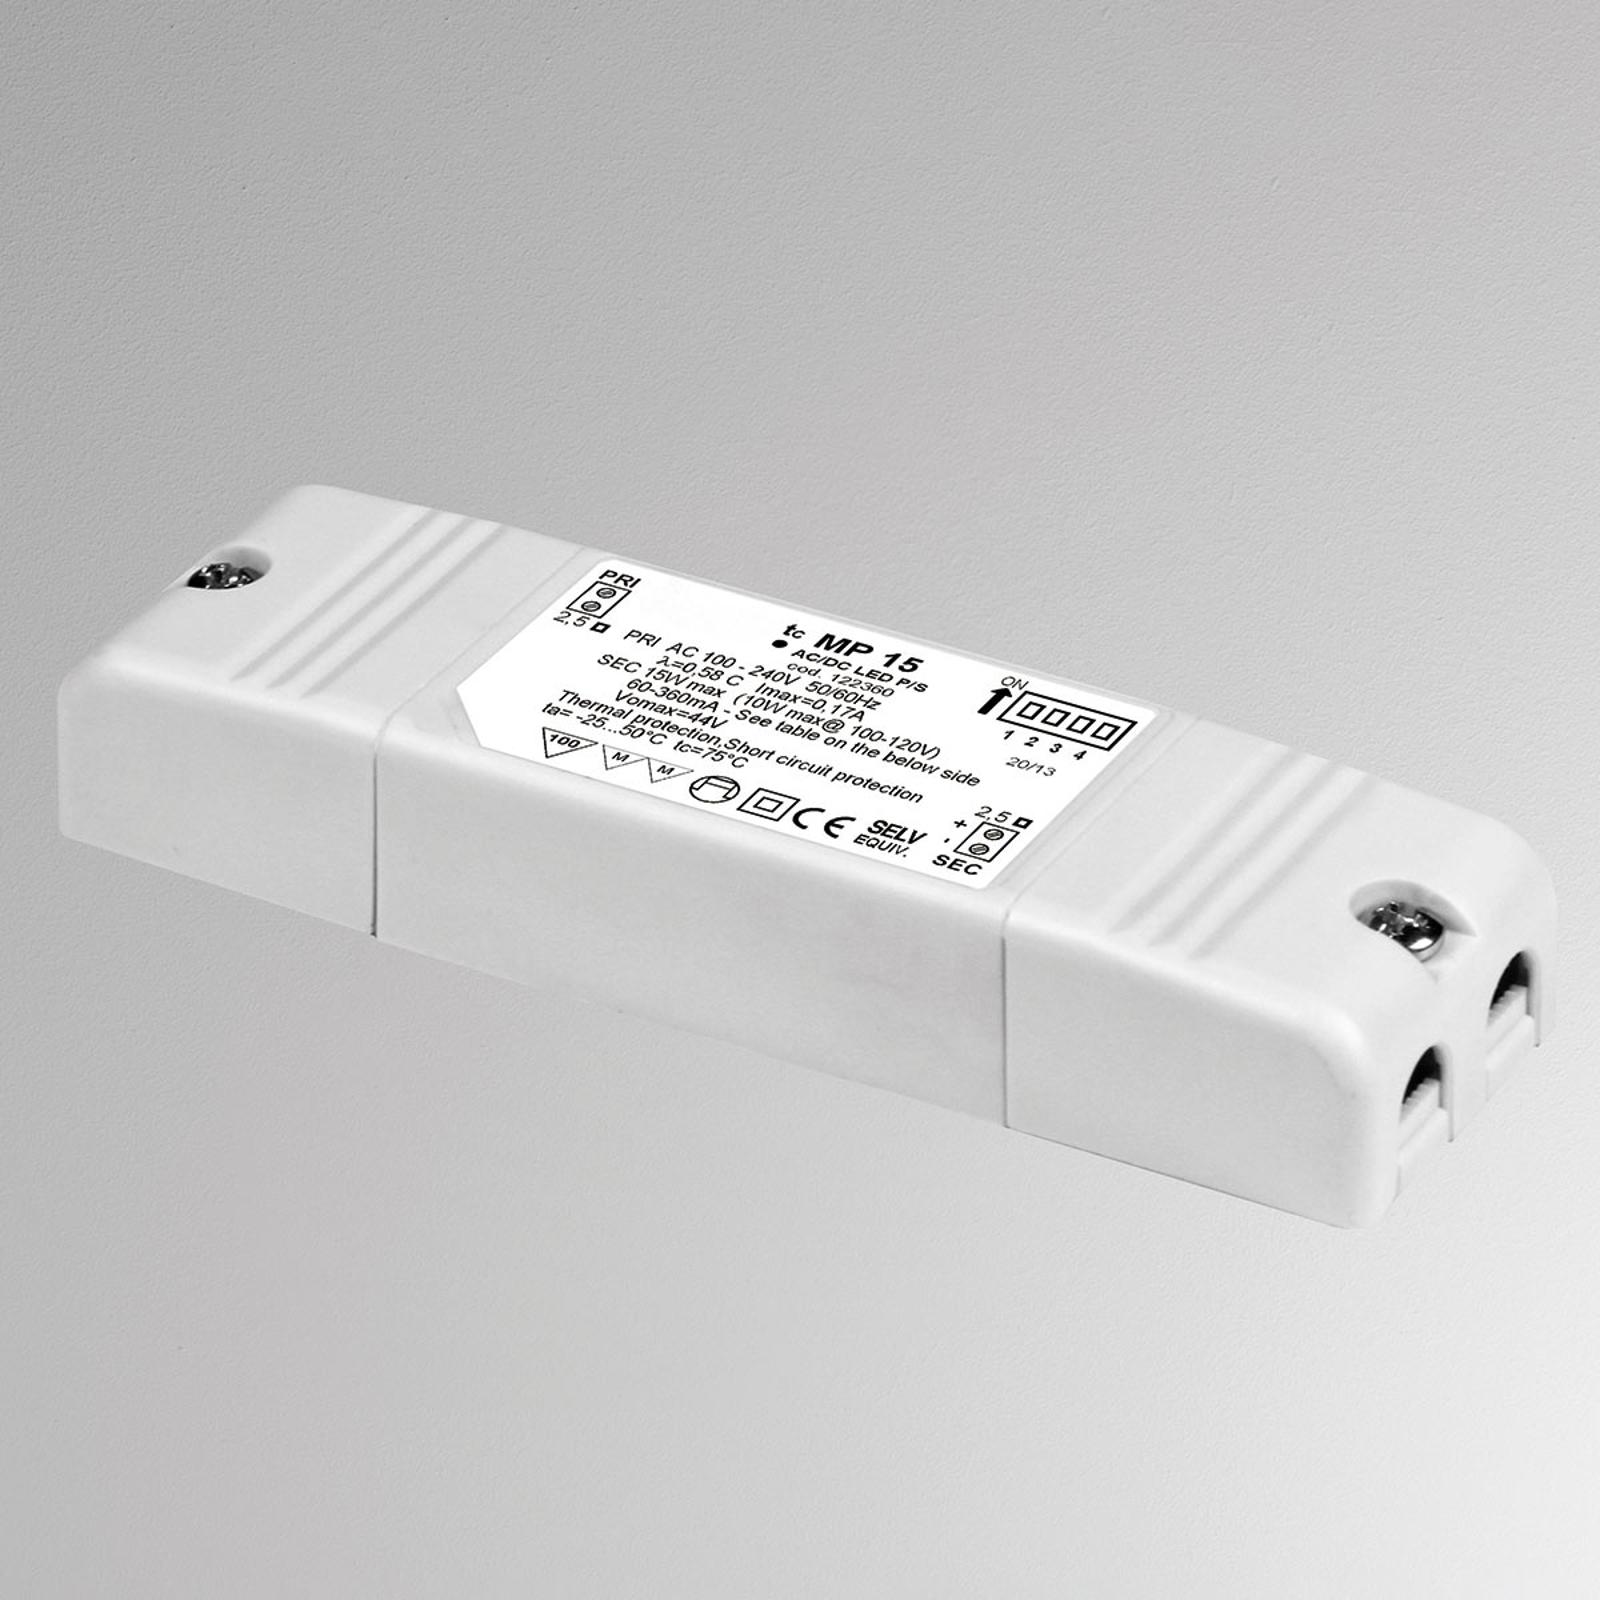 LED-Konverter MP15, einstellbar, nicht dimmbar